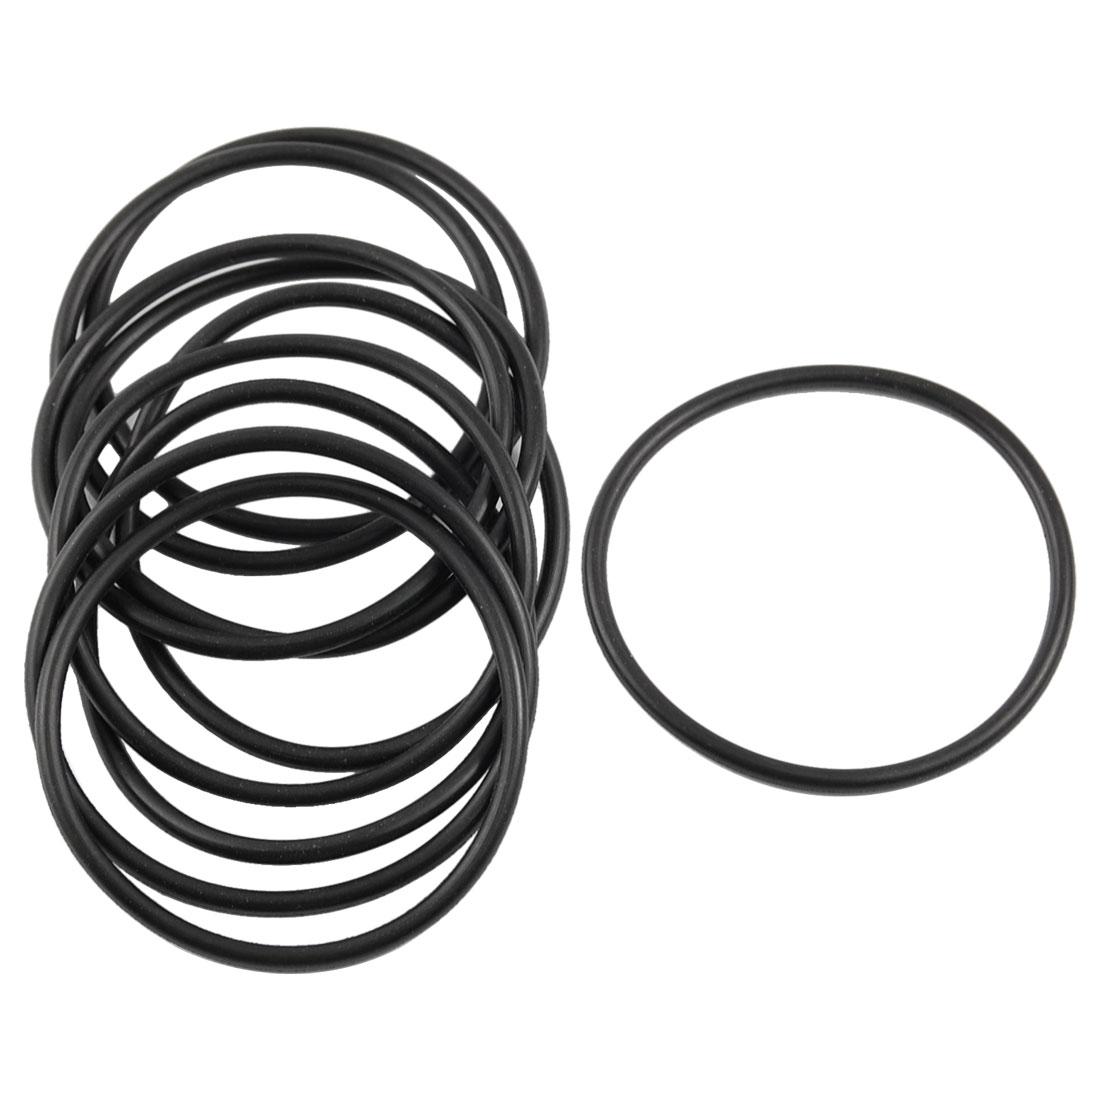 10 Pcs 39mm x 2mm x 35mm Mechanical Black NBR O Rings Oil Seal Washers